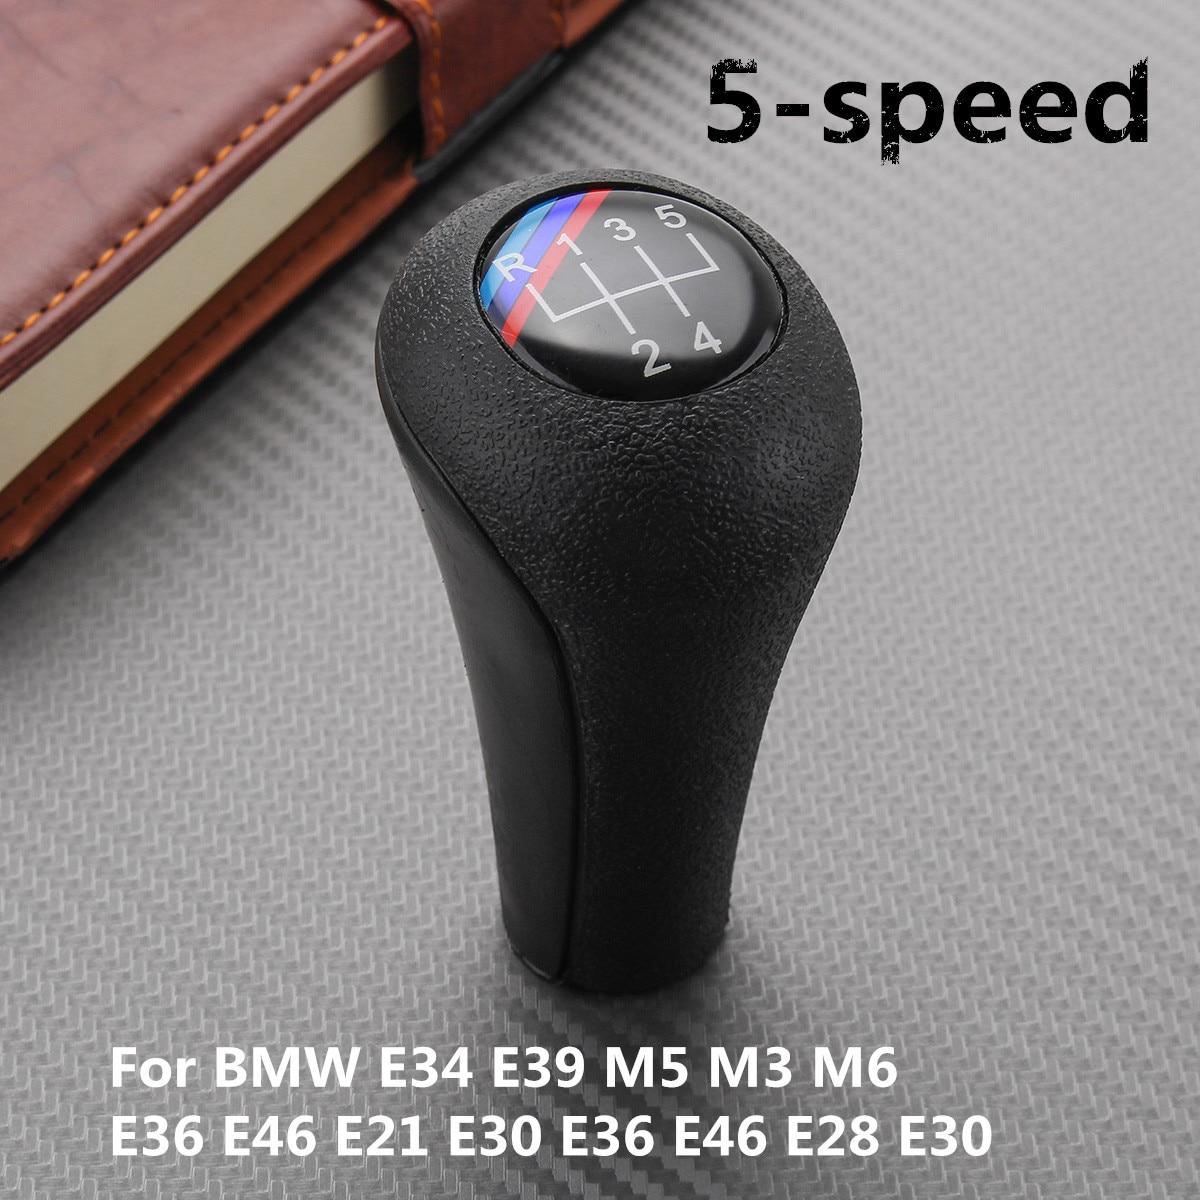 Natural leather !!! BMW GEAR SHIFT KNOB E21 E28 E30 E34 E36 E39 E46-5 speed